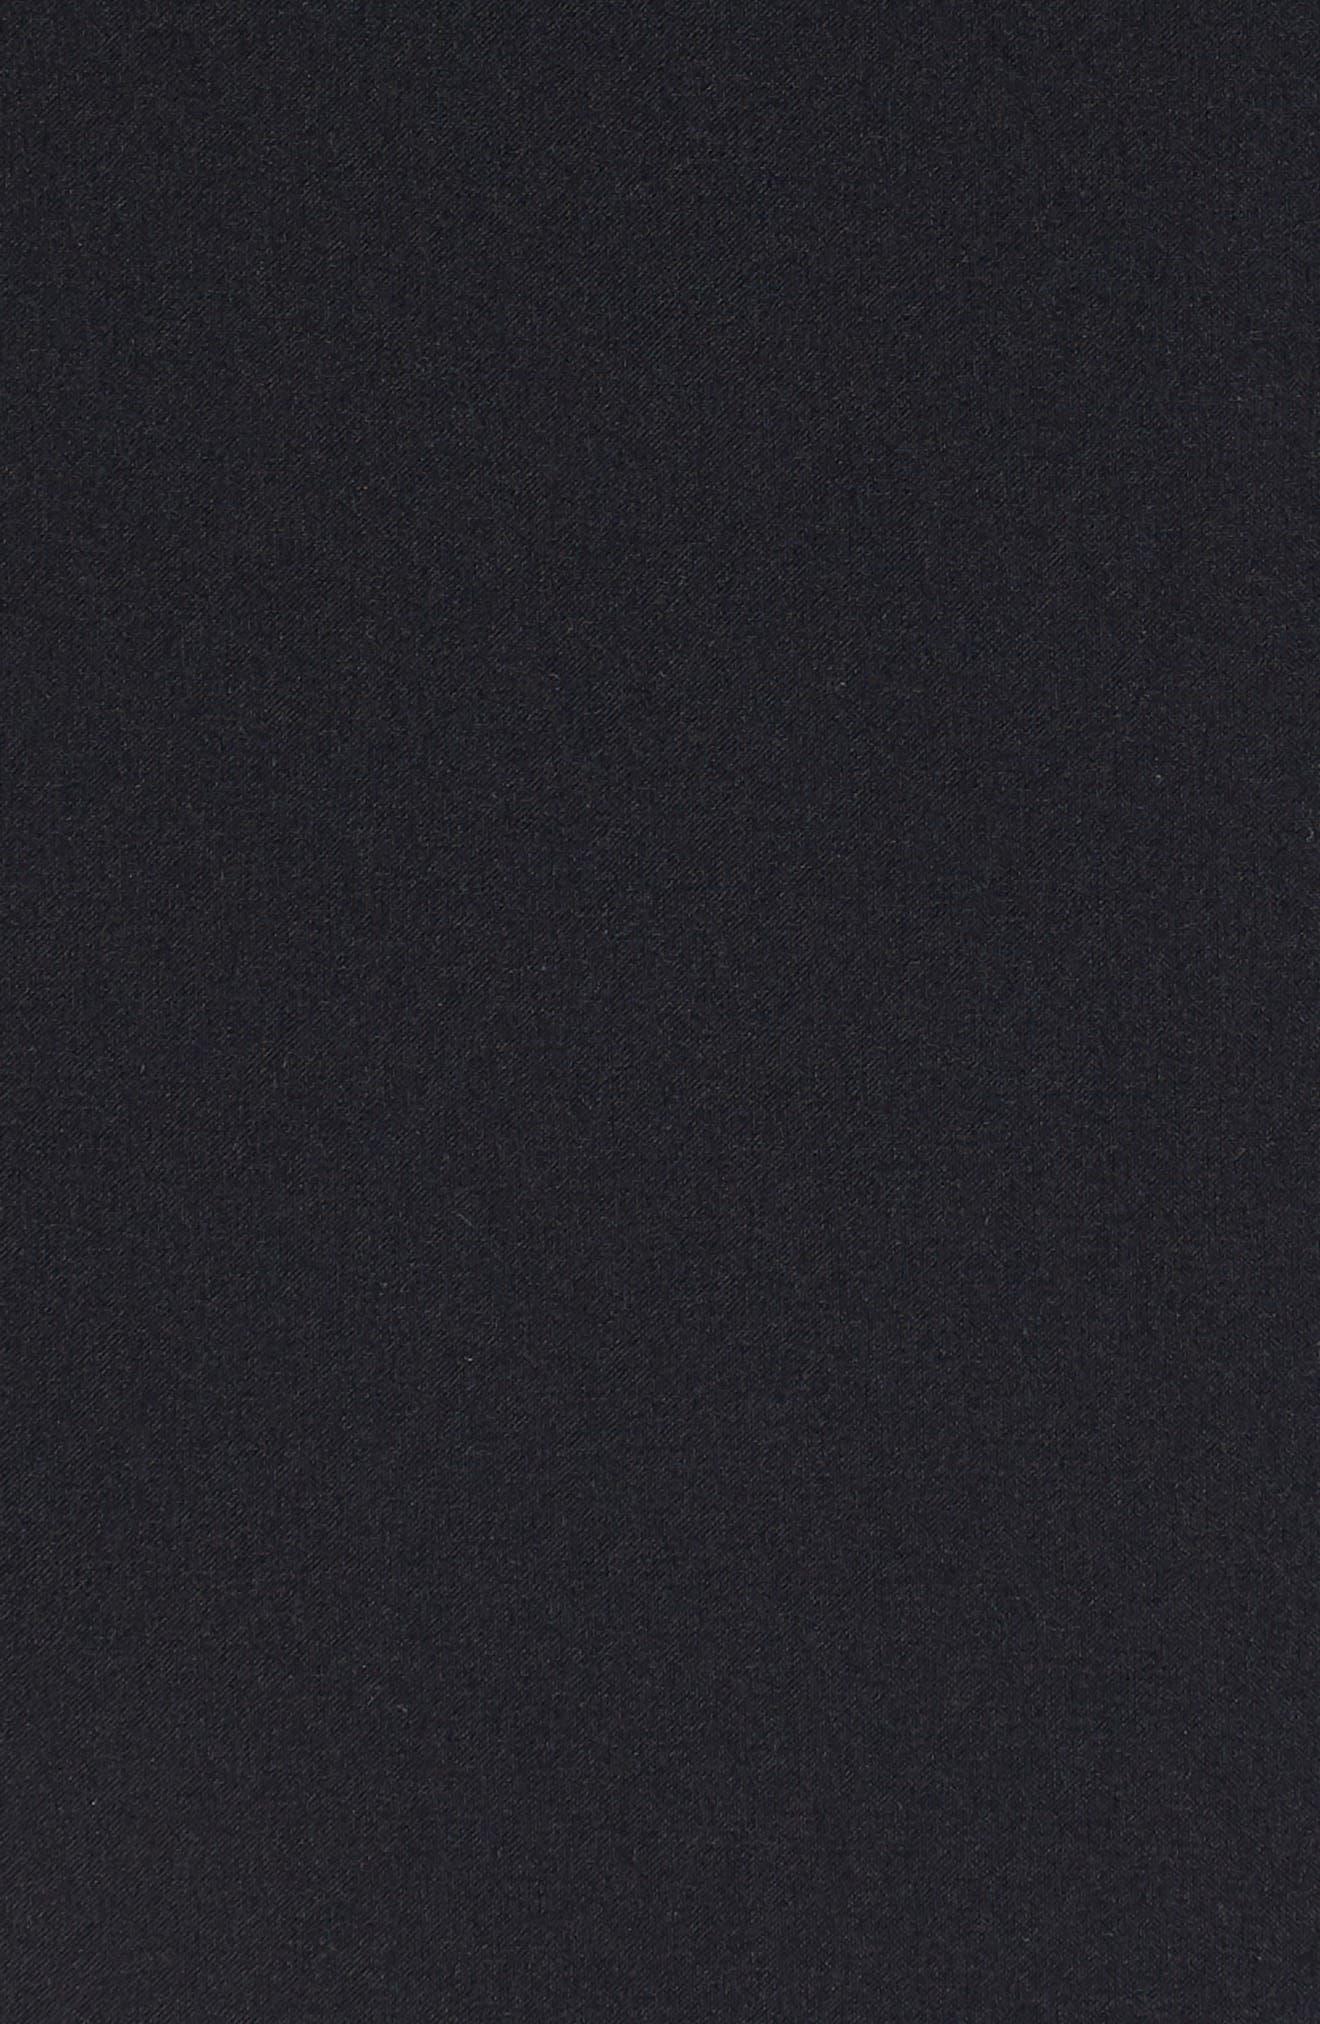 CANADA GOOSE,                             Breton 675-Fill Power Down Coat,                             Alternate thumbnail 6, color,                             BLACK